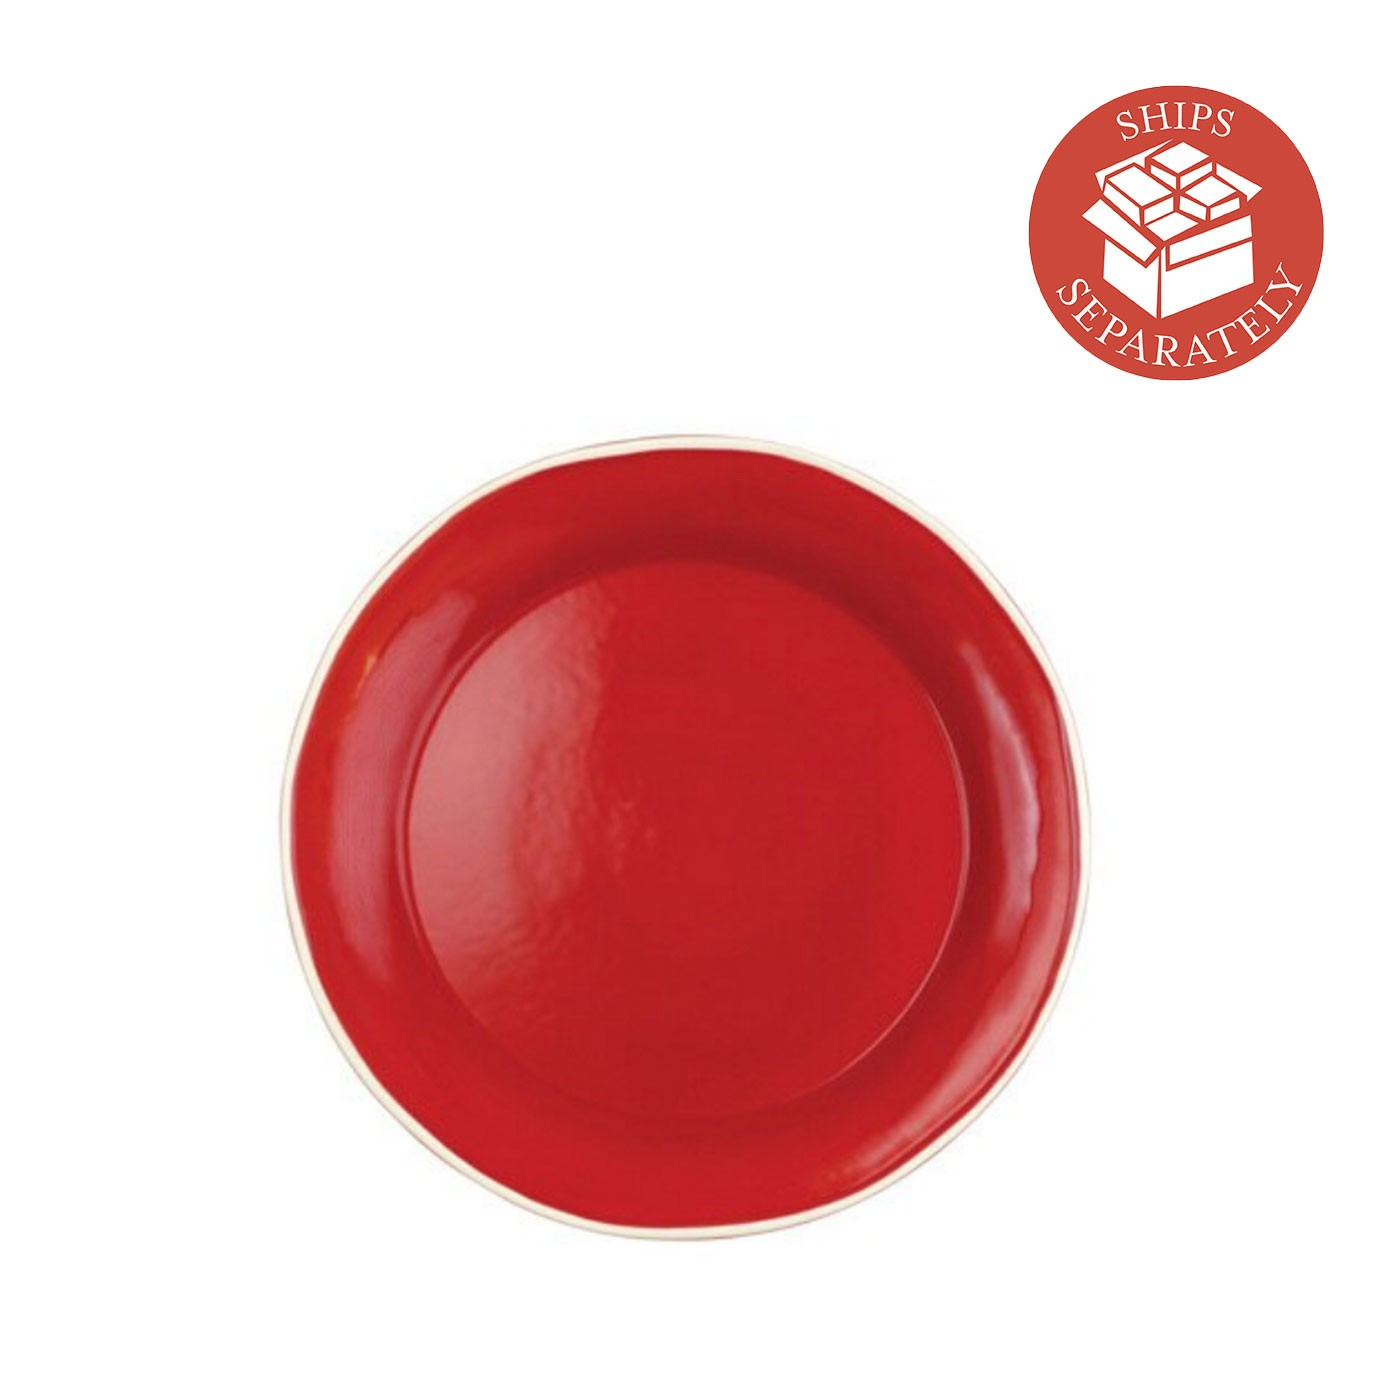 Chroma Red Dinner Plate - Vietri | Eataly.com